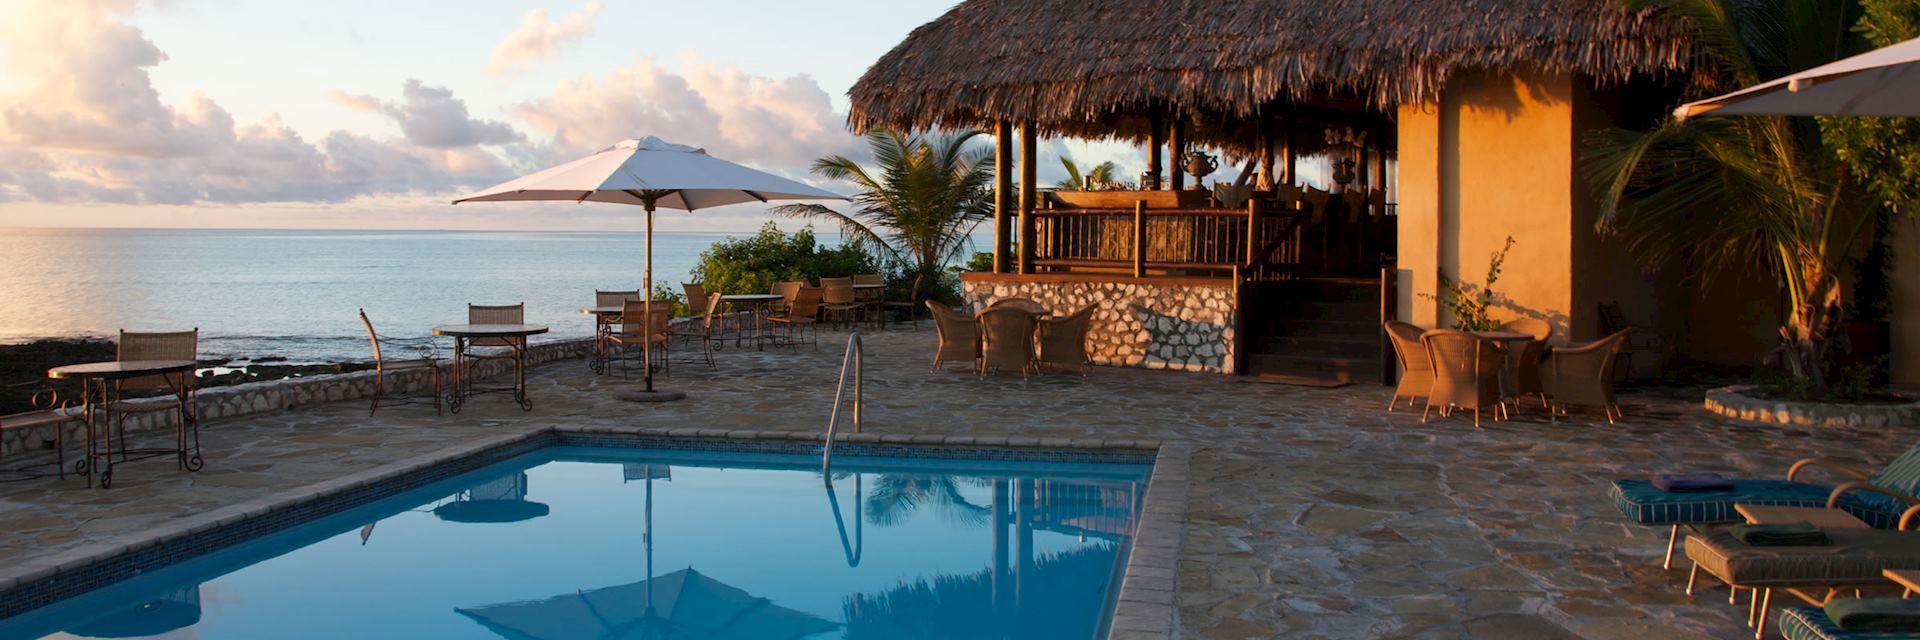 Medjumbe Island Resort on Anantara Medjumbe Island, Mozambique